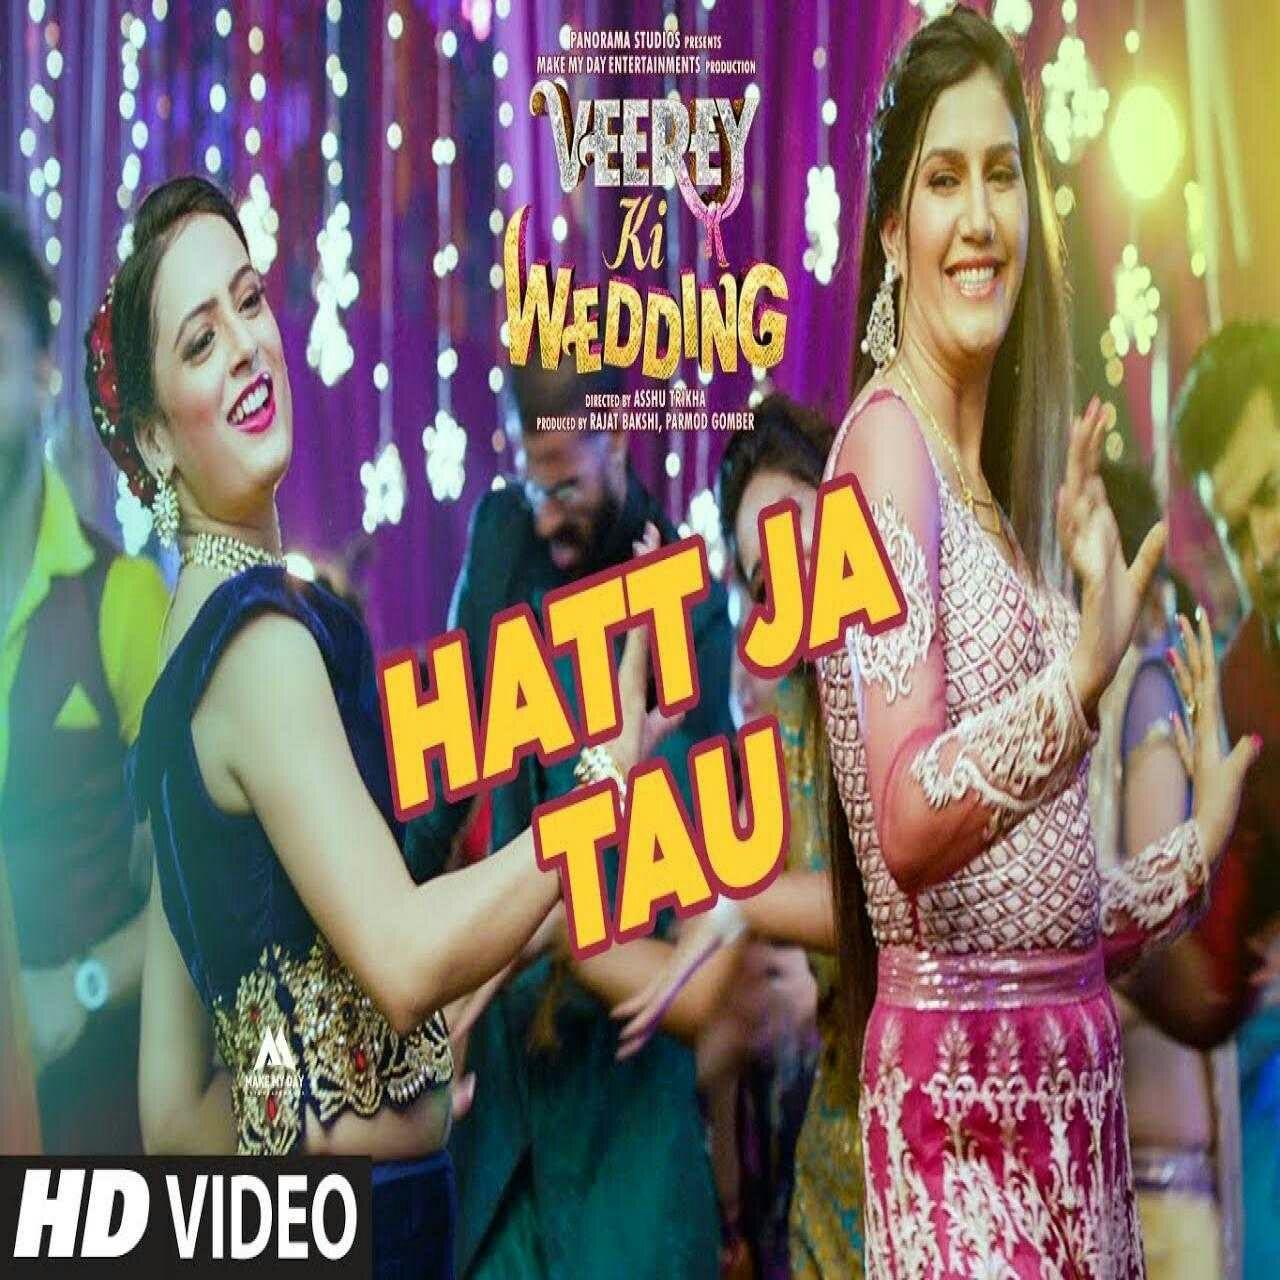 Dj Akhilesh chhatarpur mixing song chhatarpur 8889625056